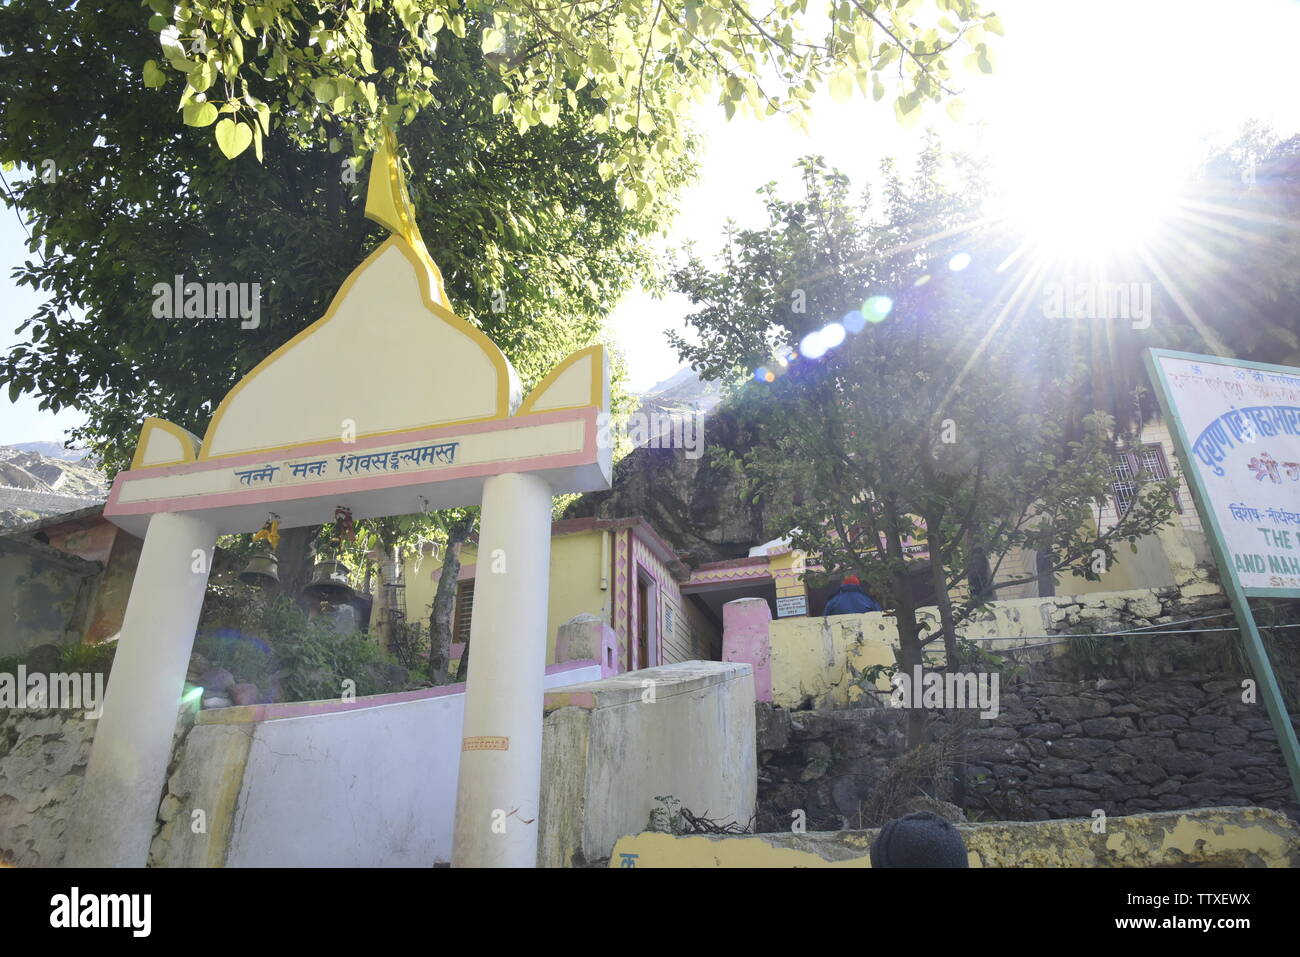 Ganesh Gufa ou caverne à l'Inde, dernier village Village Mana 2019 près de Badrniath Rudrapryag , Chamoli, Inde, Asie, Banque D'Images